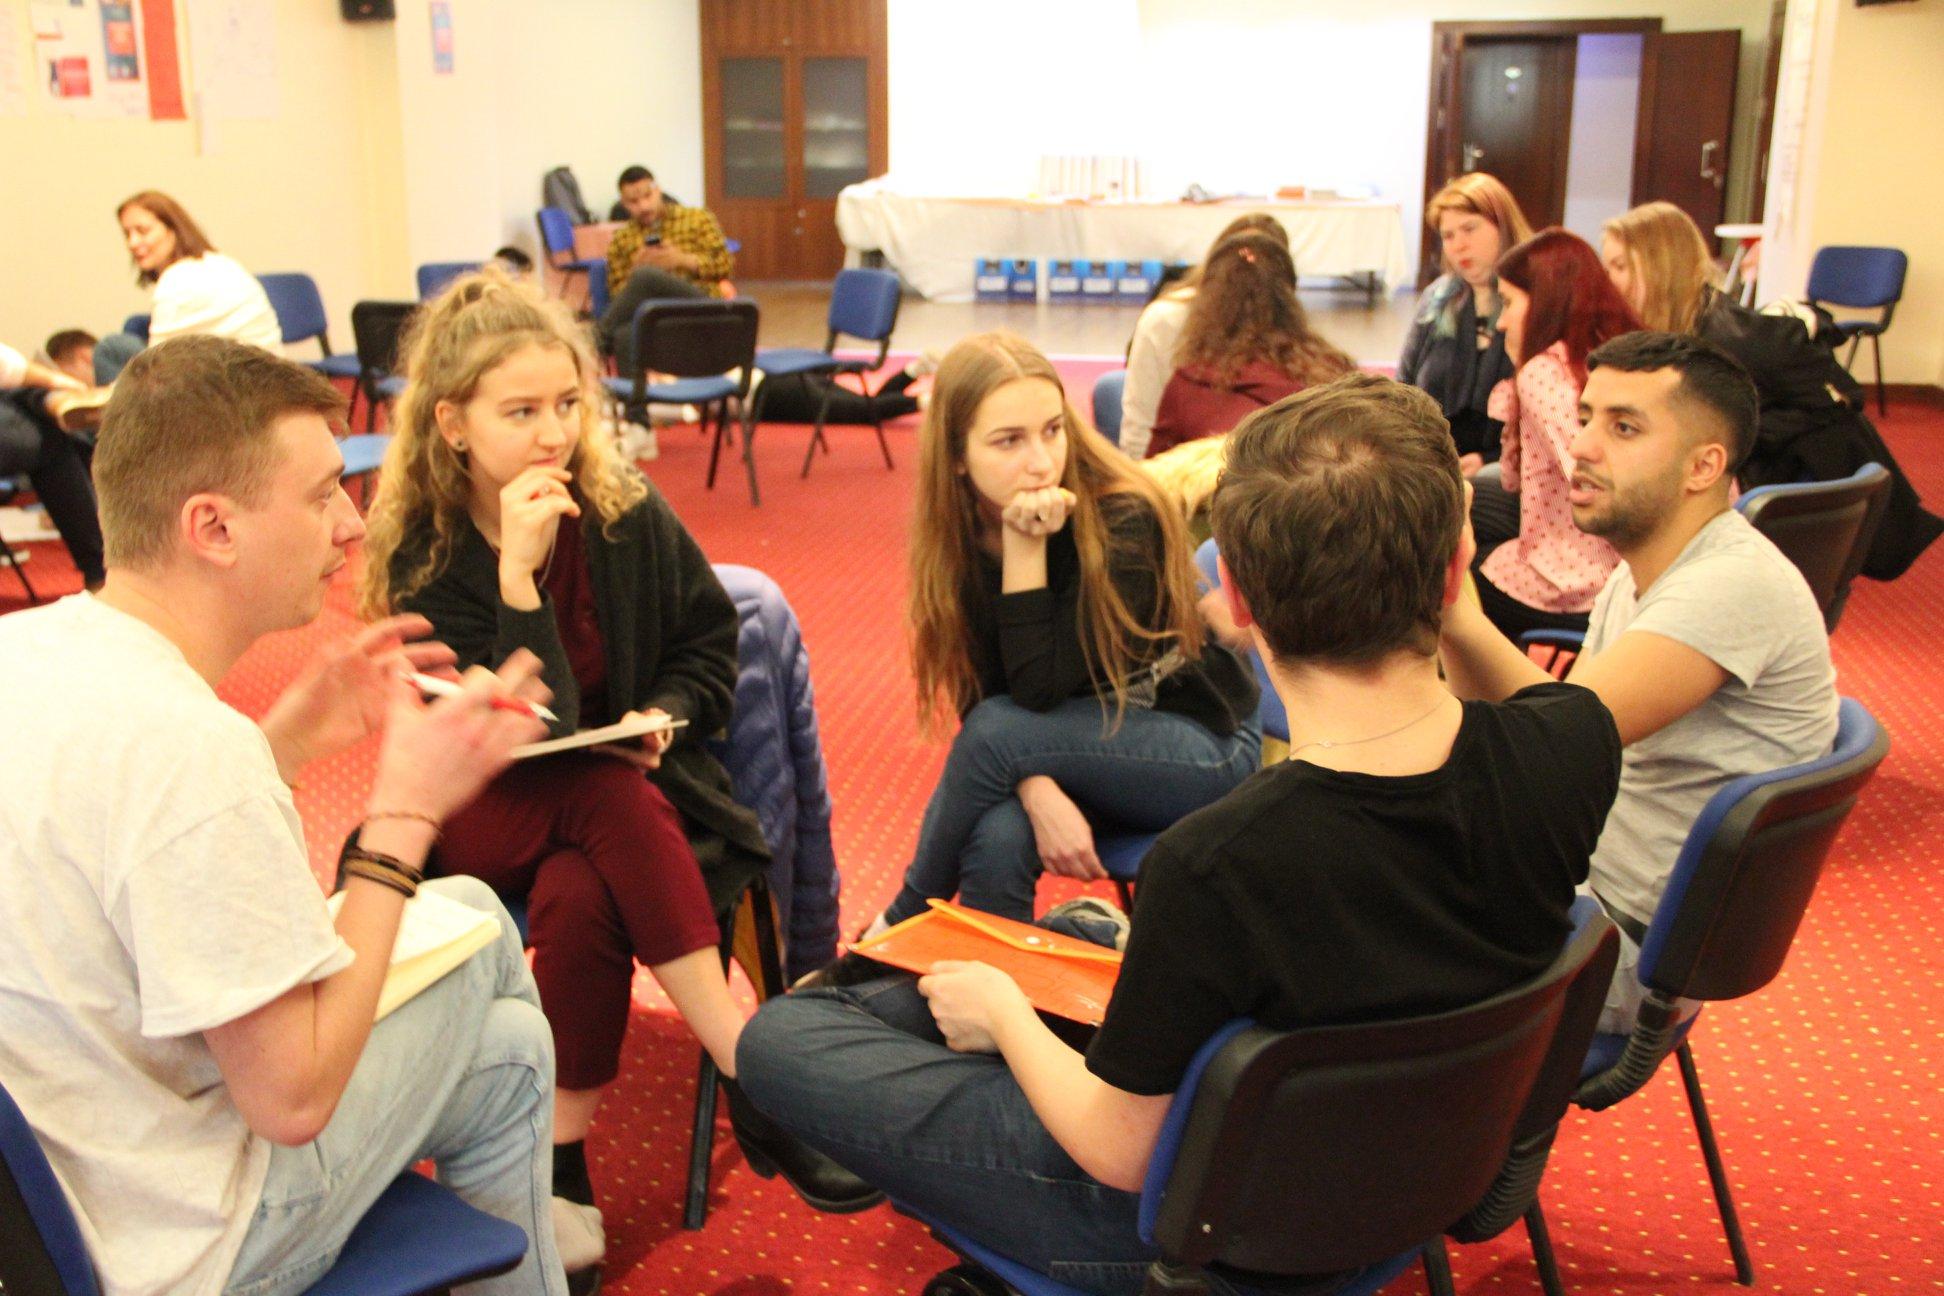 koolitus training course nyh turkey turgi estonia eesti erasmus youthpass